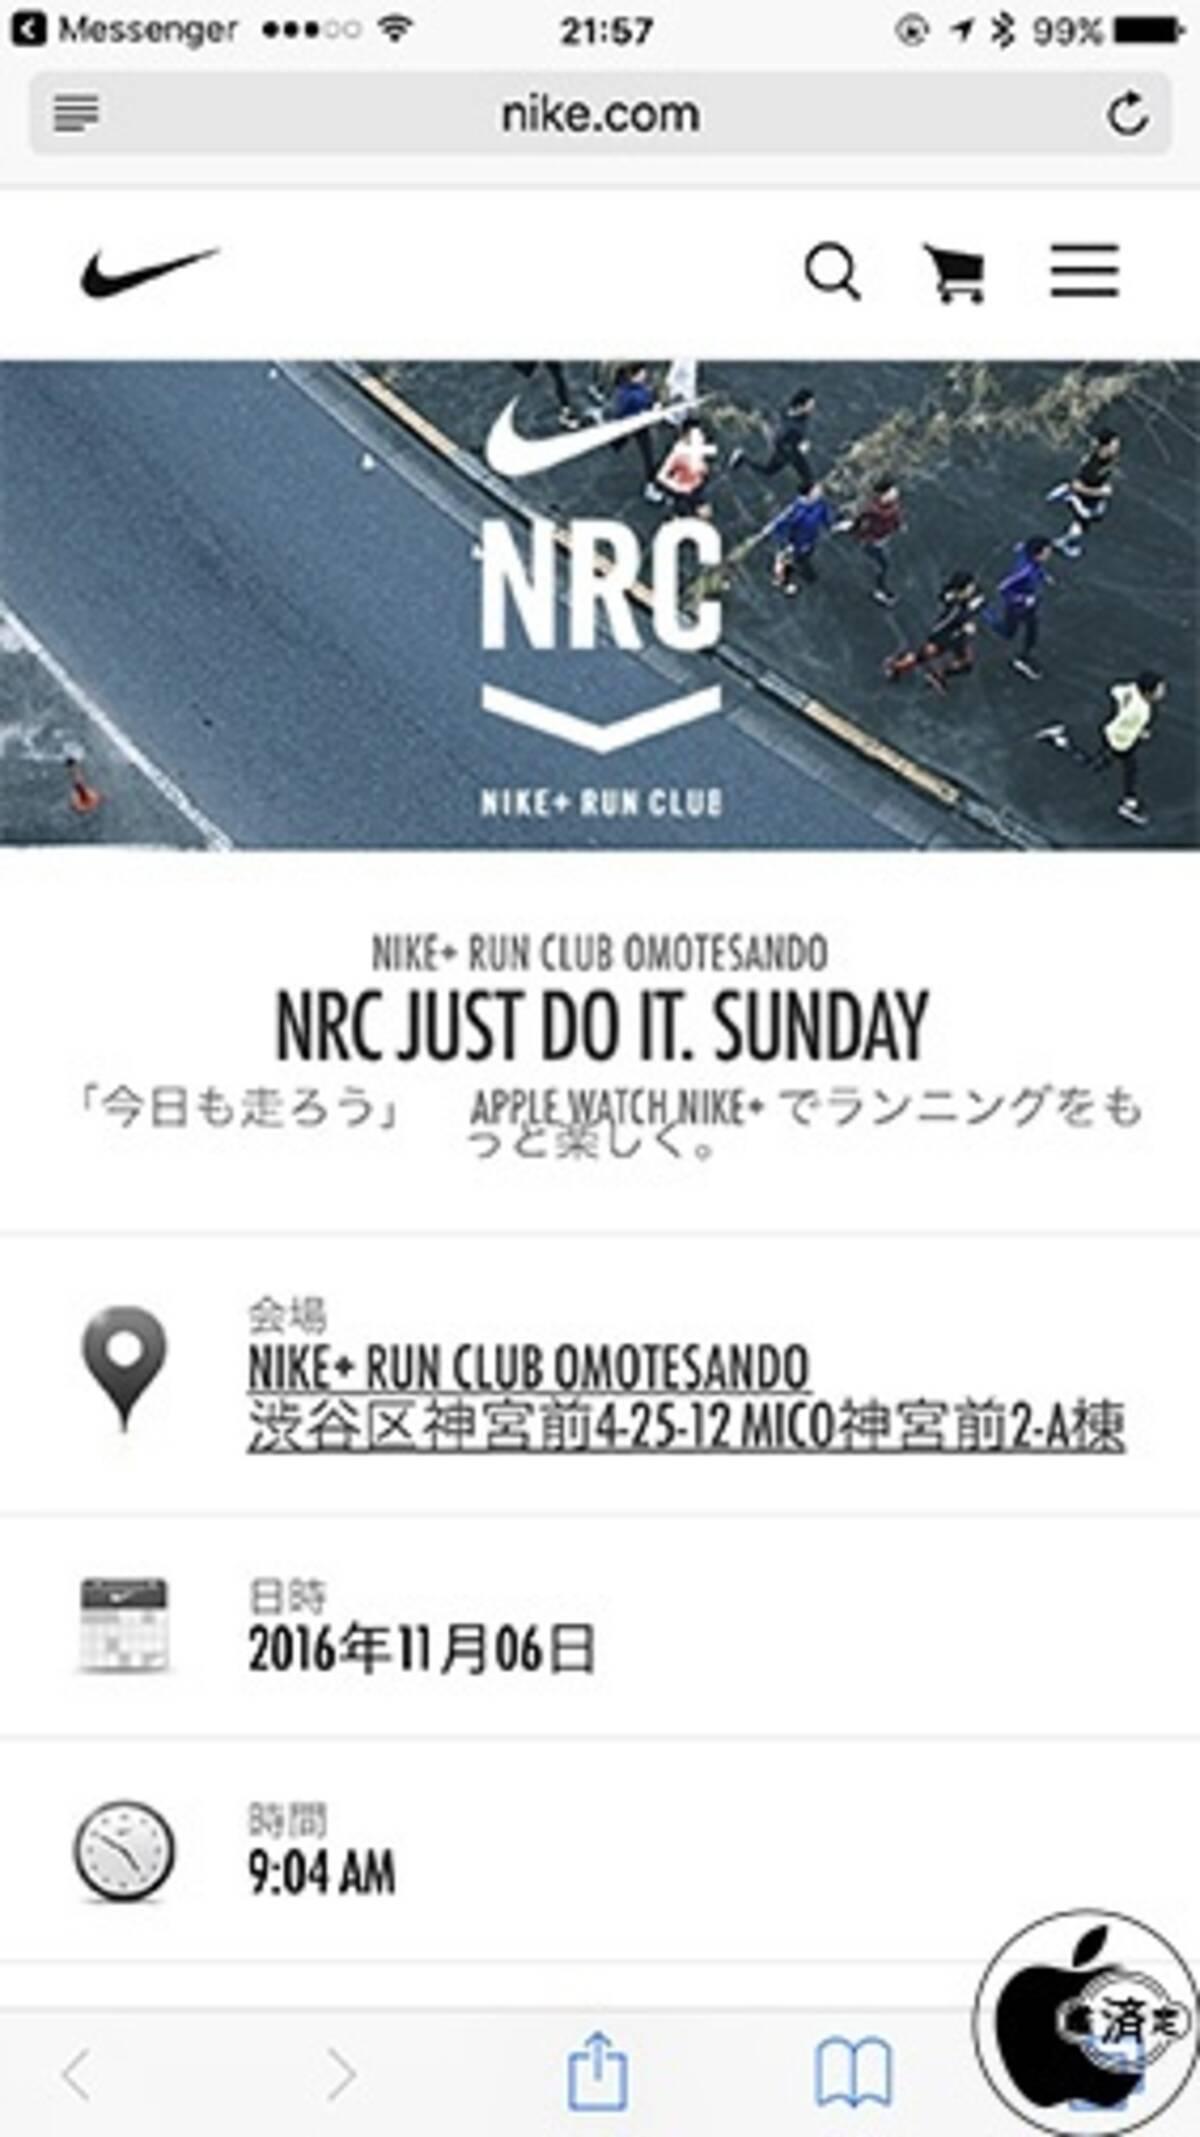 e8f6693d5e ナイキ、11月06日にAPPLE WATCH NIKE+イベント「NRC JUST DO IT. SUNDAY ...